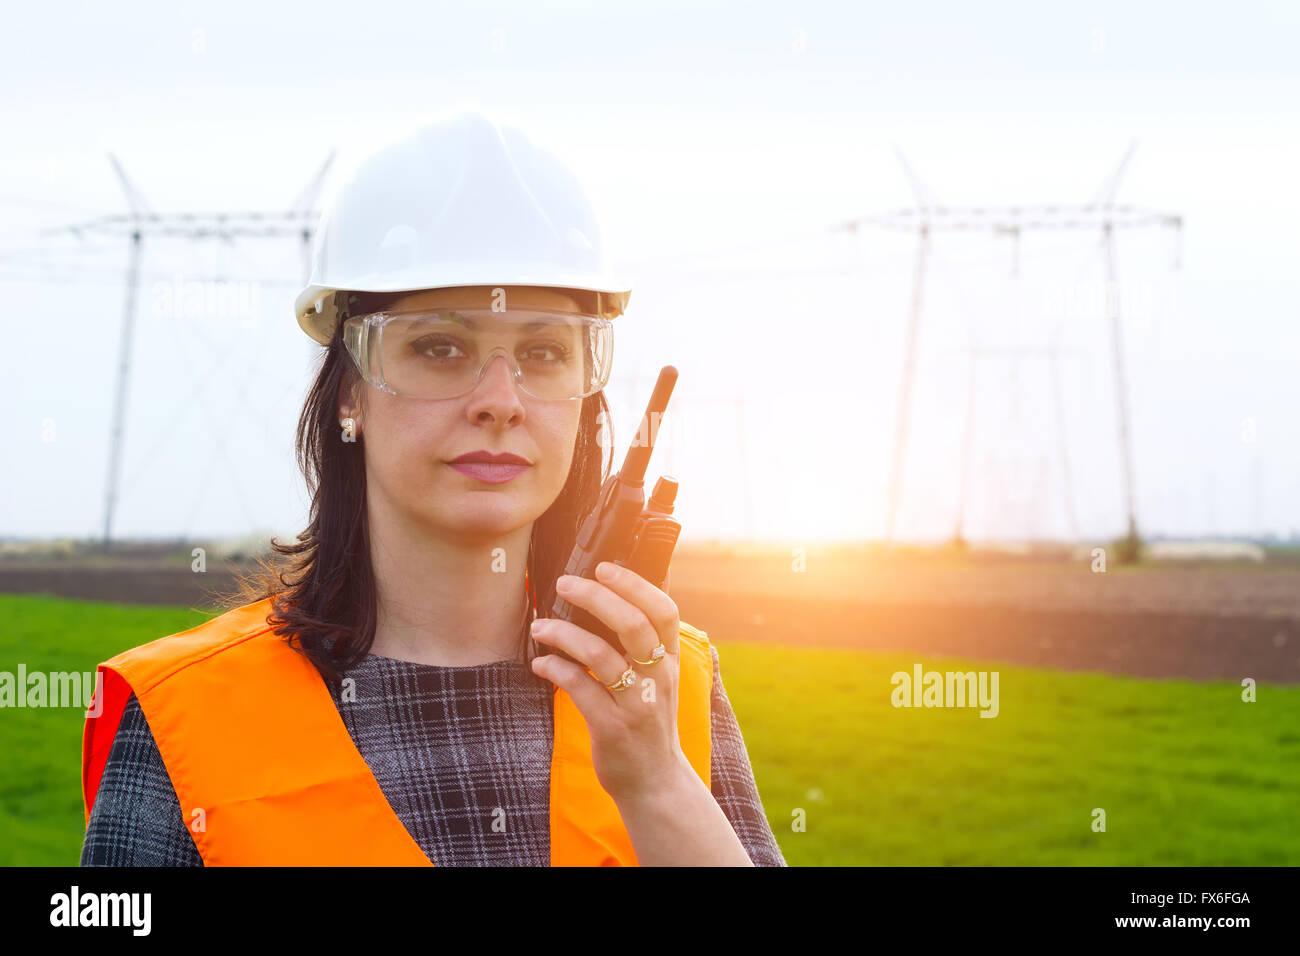 Electrification engineer talk a walkie-talkie Stock Photo